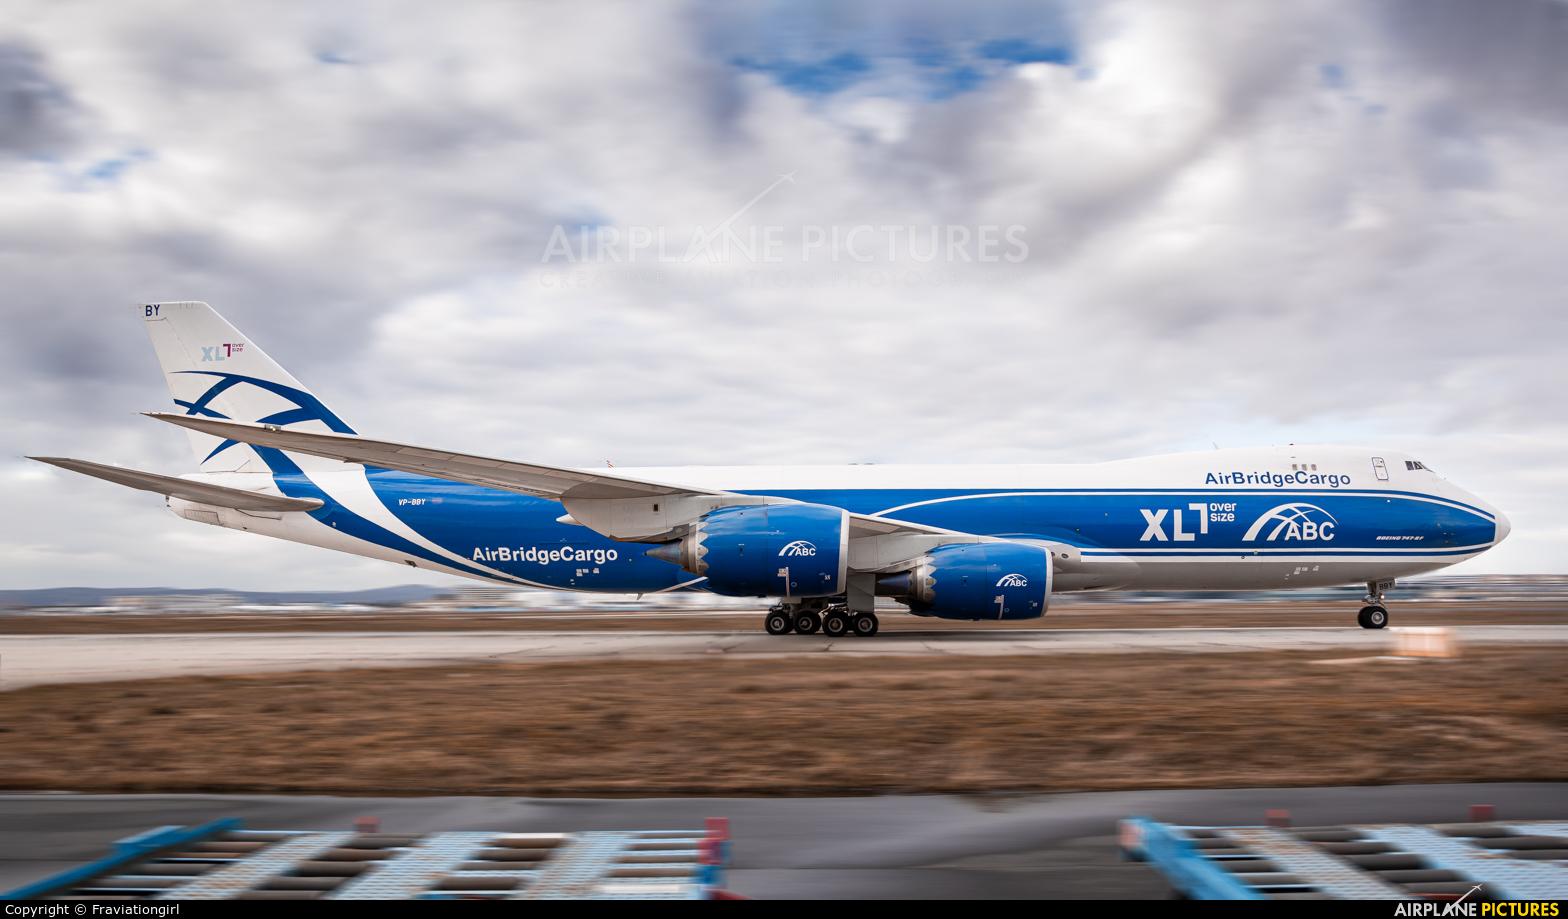 Air Bridge Cargo VP-BBY aircraft at Frankfurt